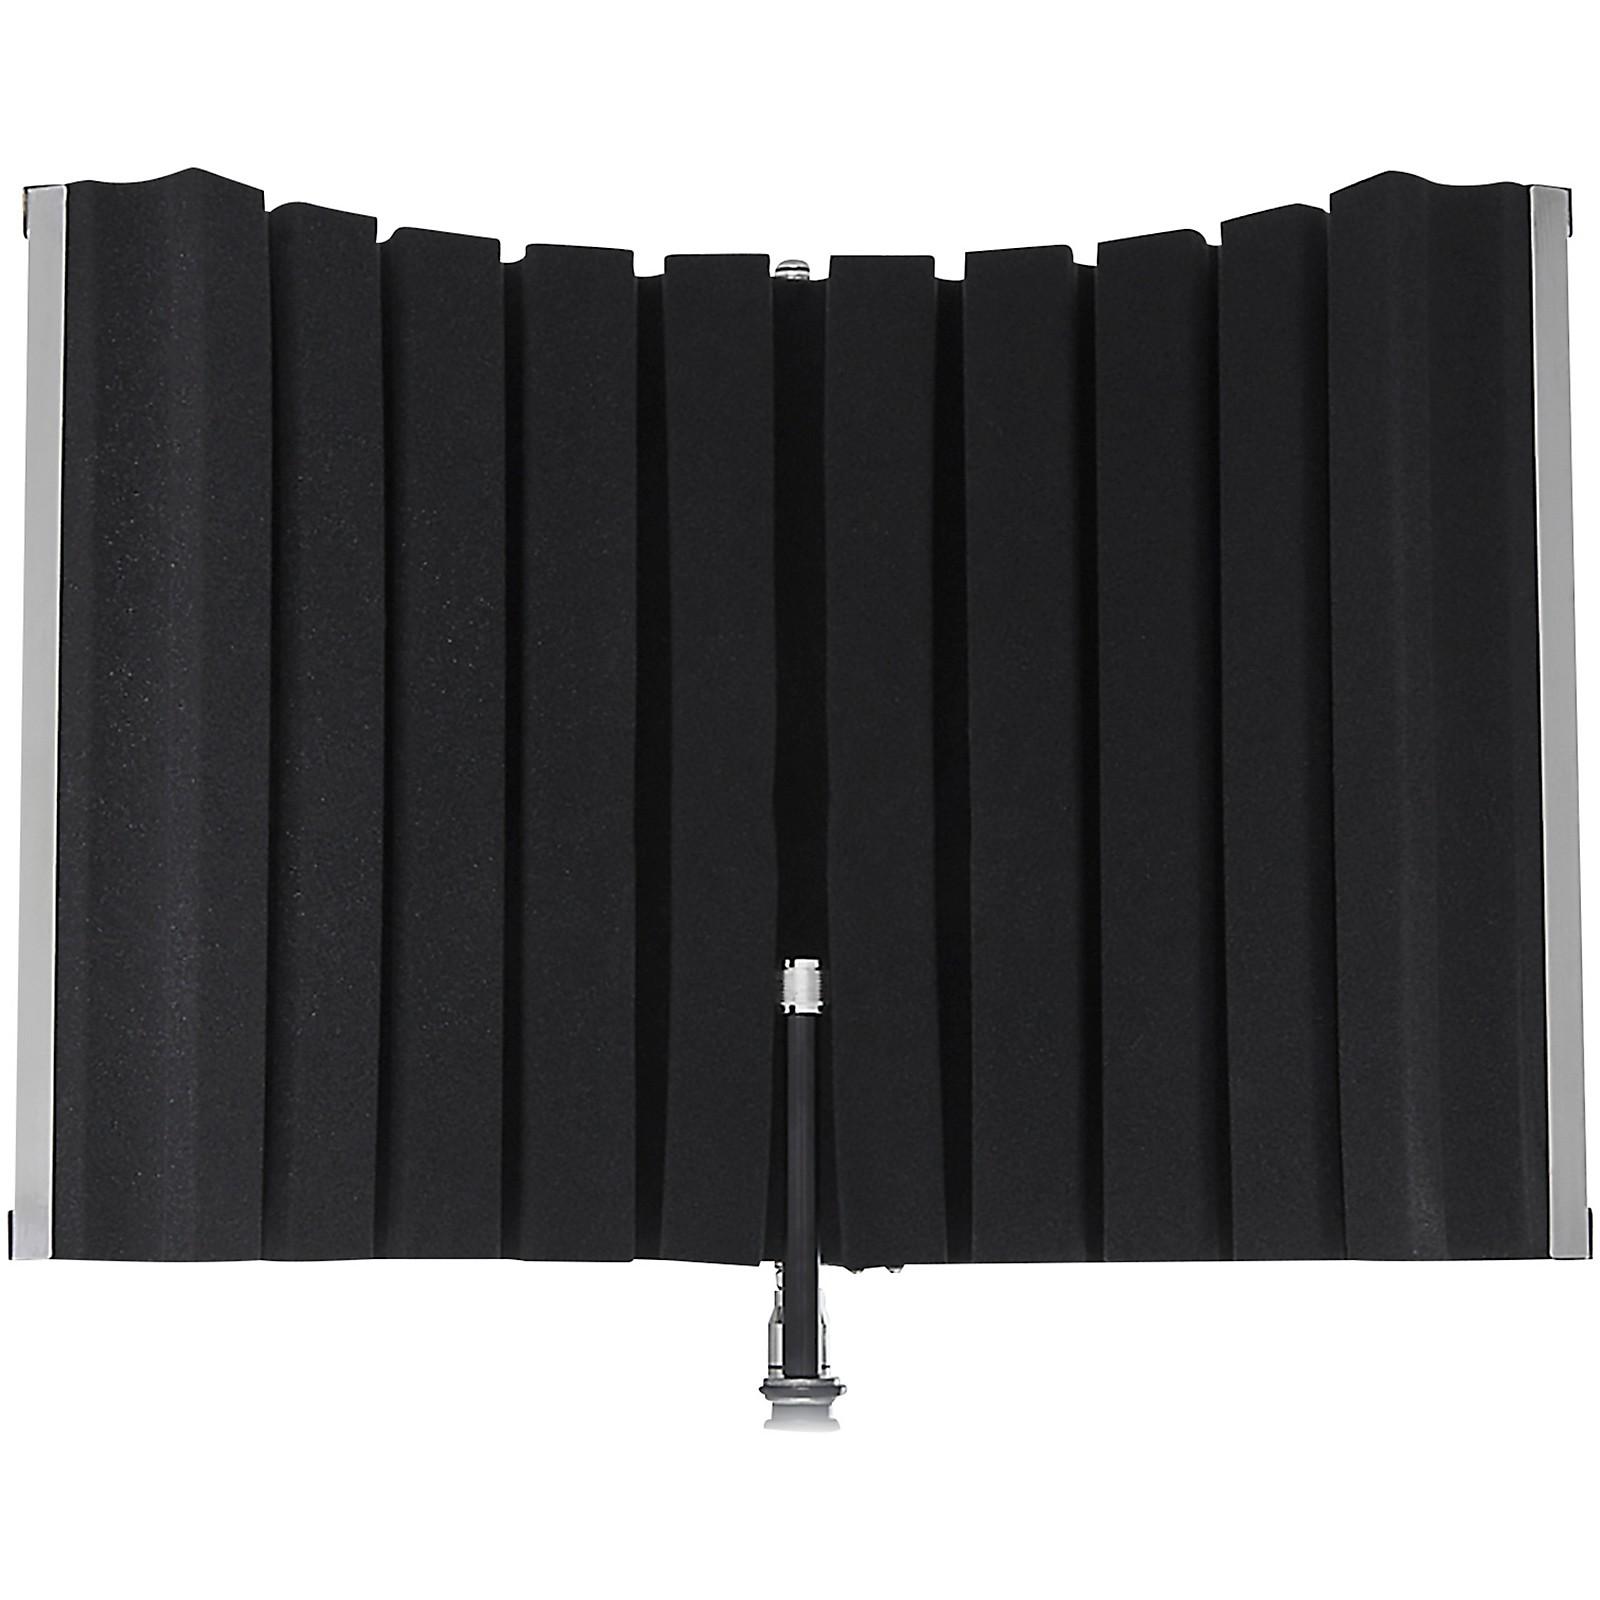 Marantz Professional Sound Shield Compact Compact, Folding Vocal Reflection Baffle